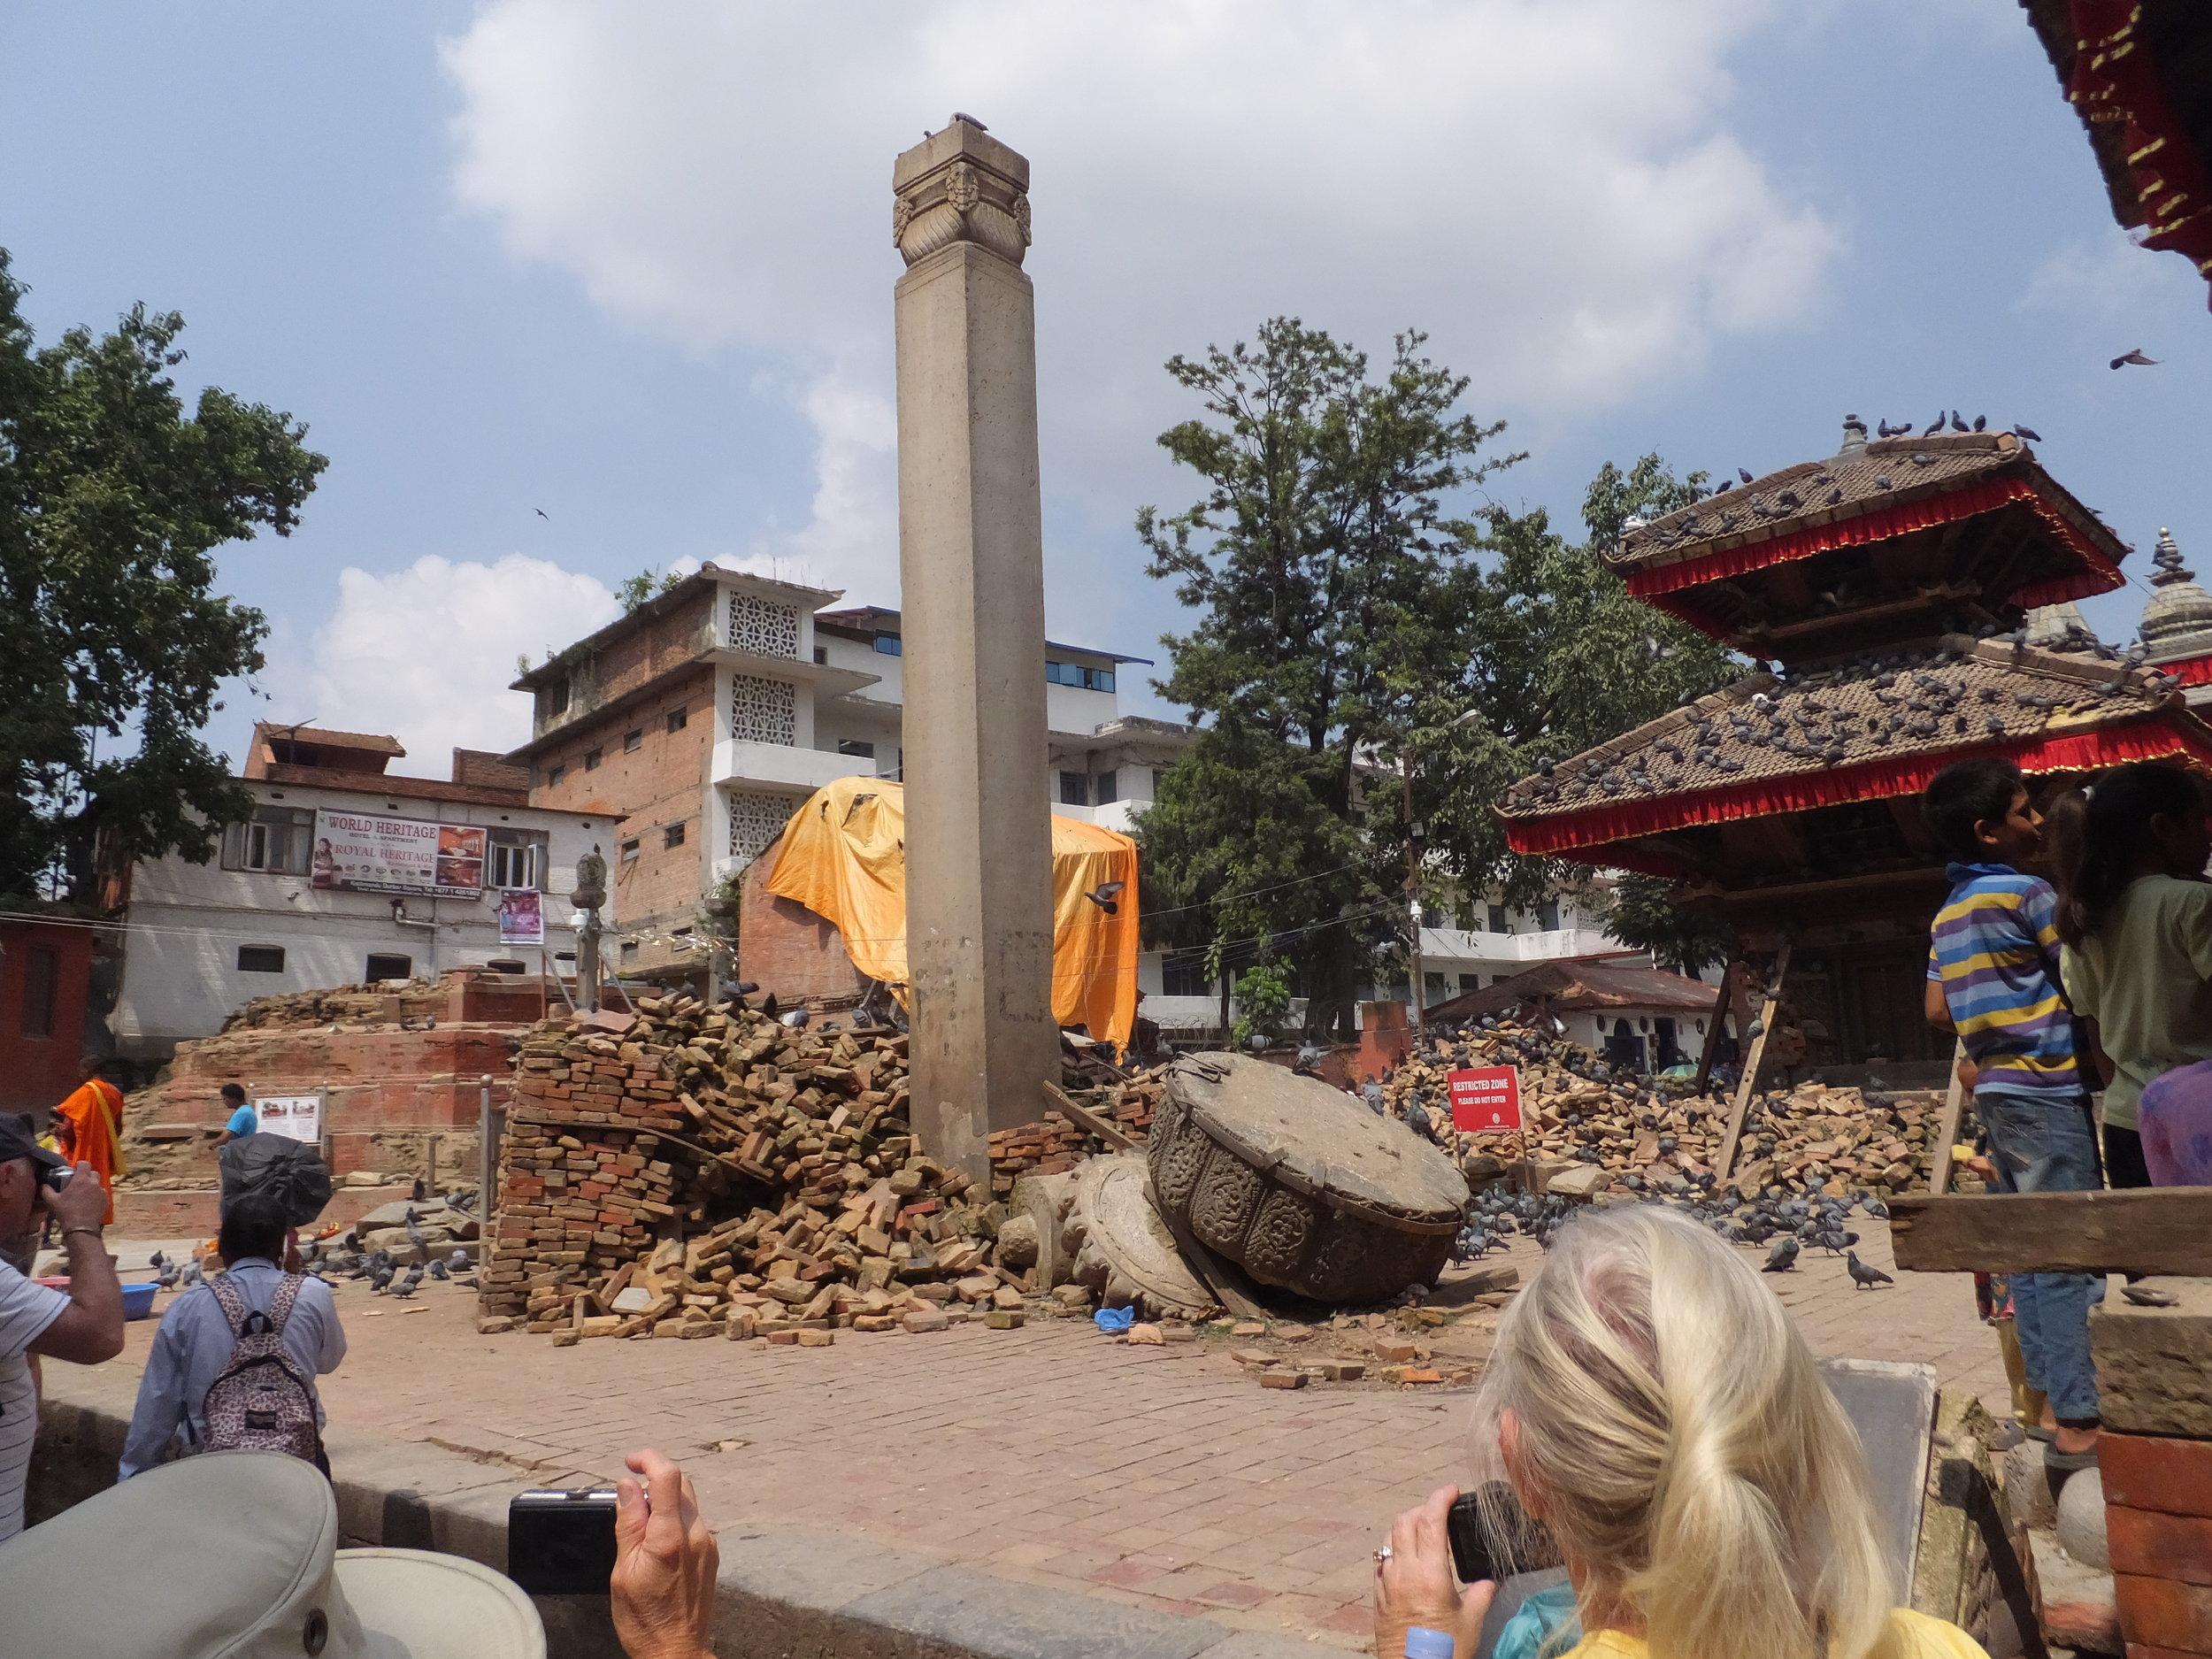 Kathmandu Durber Square World Heritage Site destruction after the earthquake 2015.